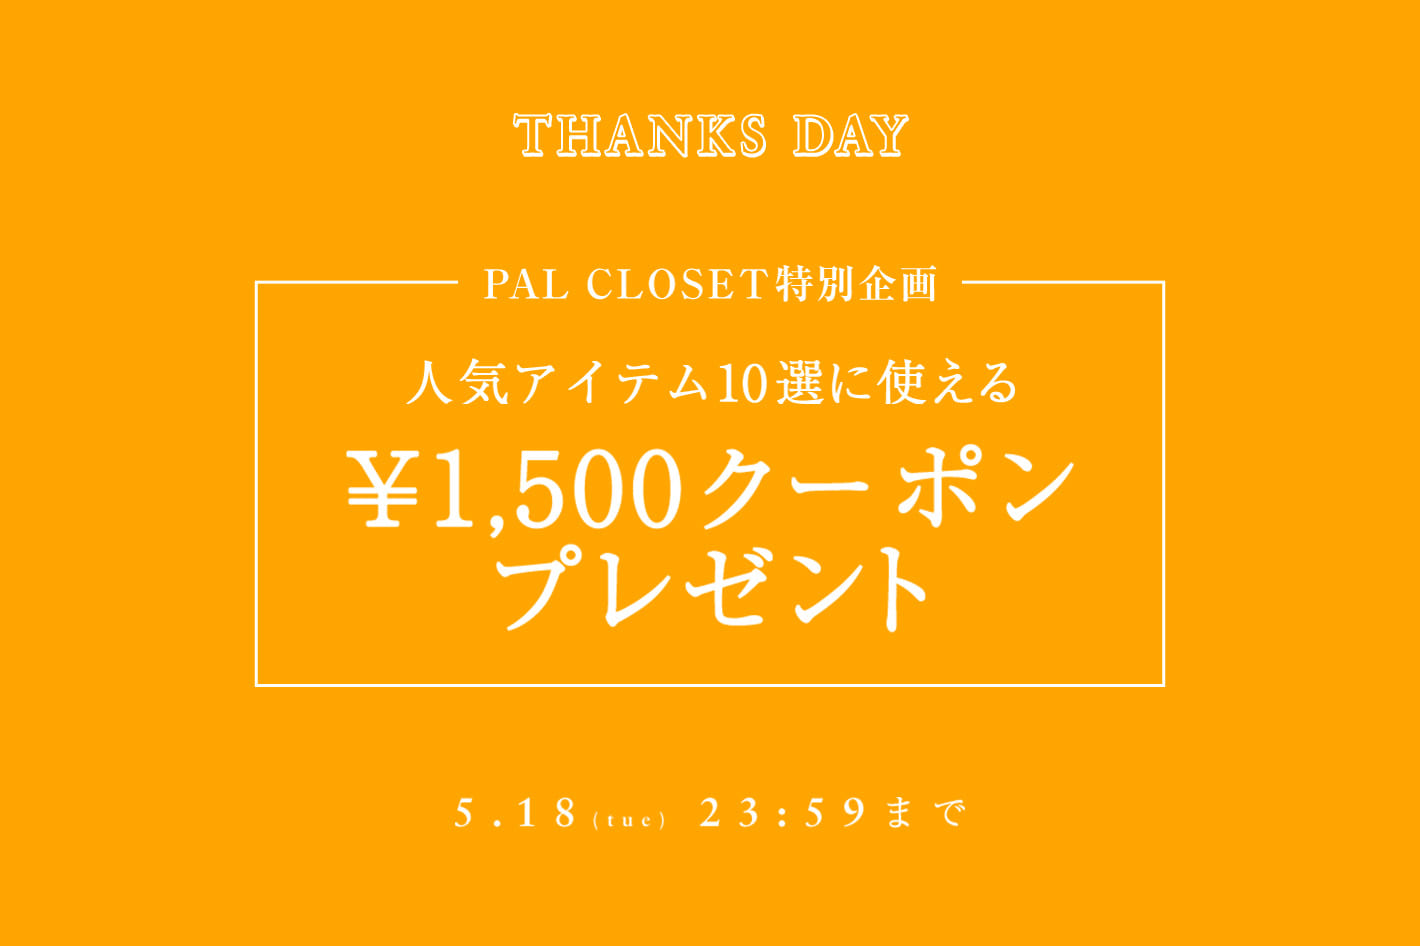 russet \THANKS DAY/PAL CLOSET特別企画 人気アイテムに使える¥1,500クーポンプレゼント